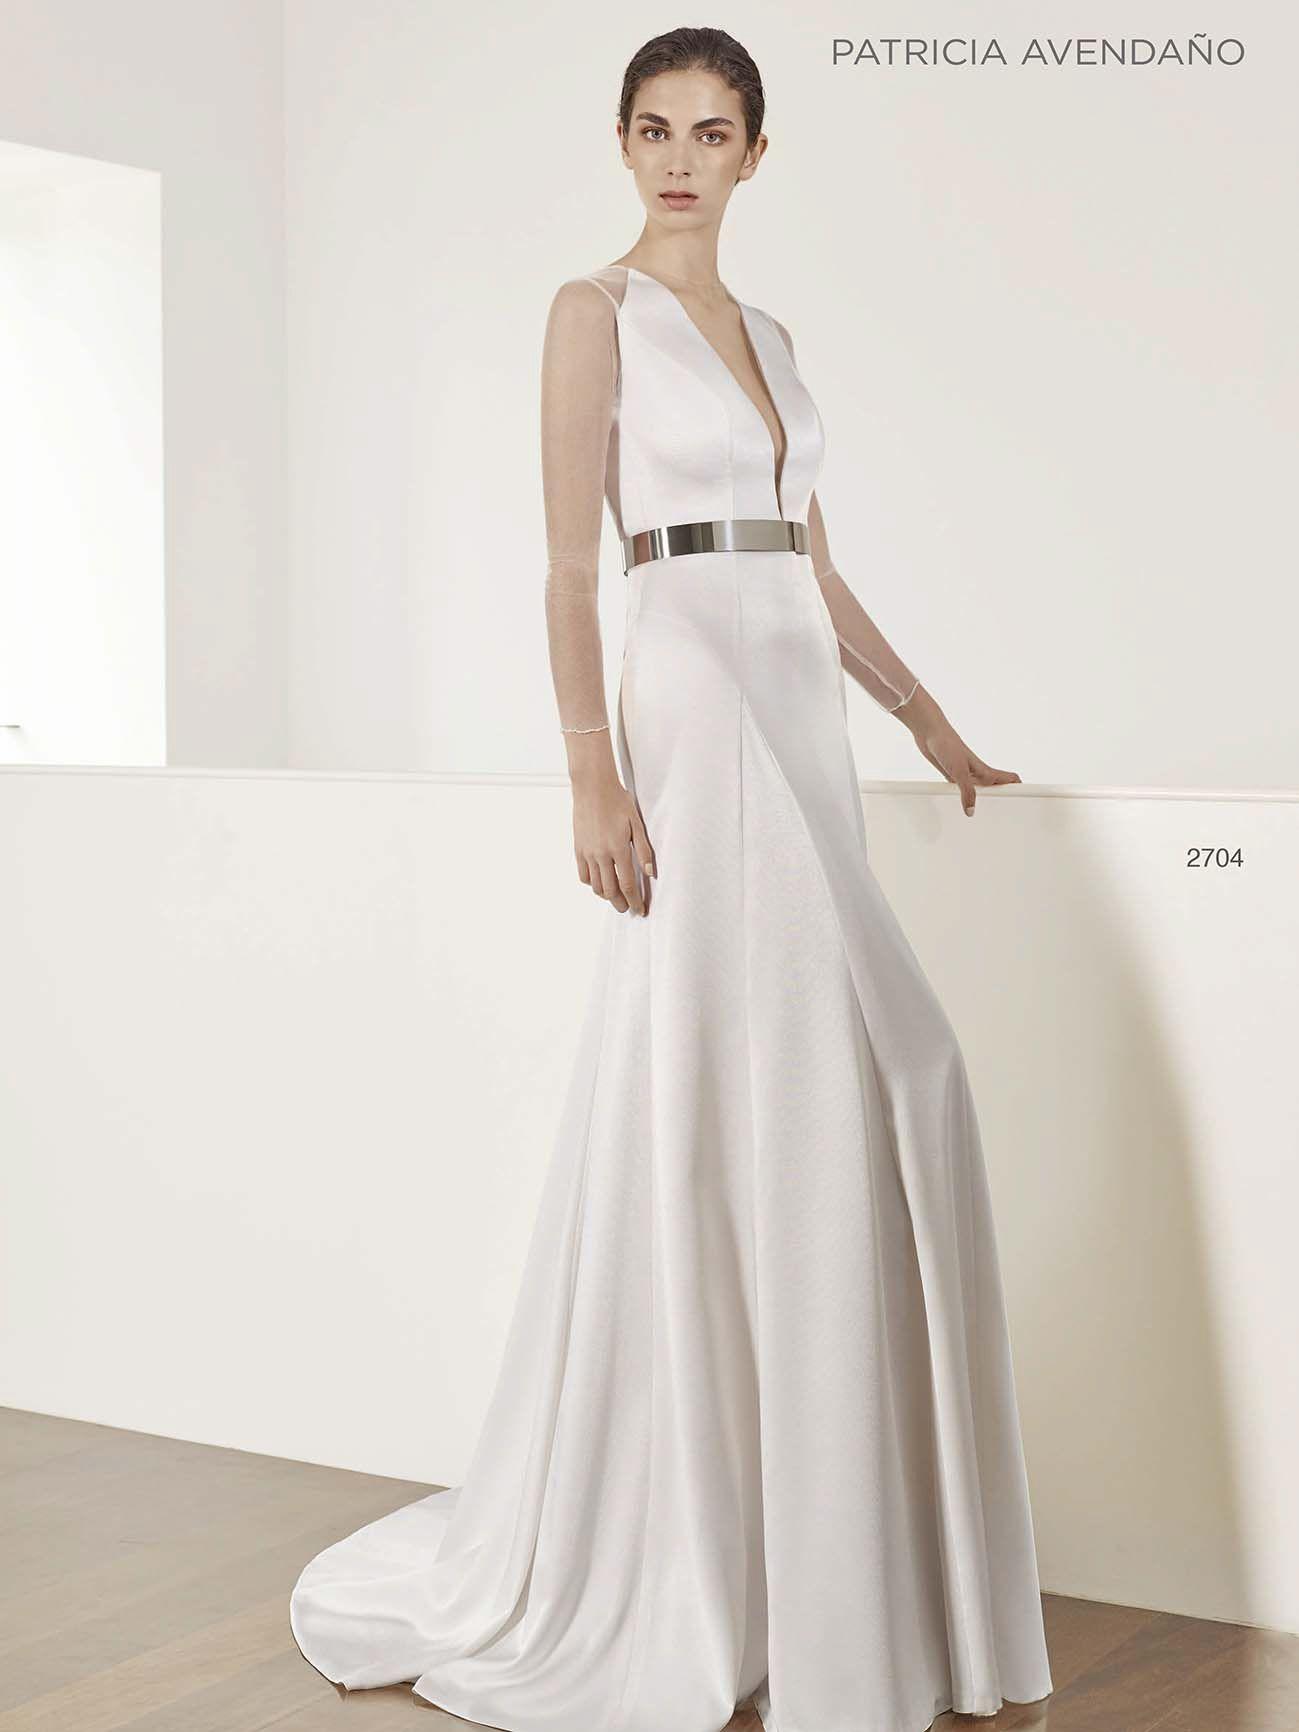 Mod patricia avendaño designer vestidos de boda